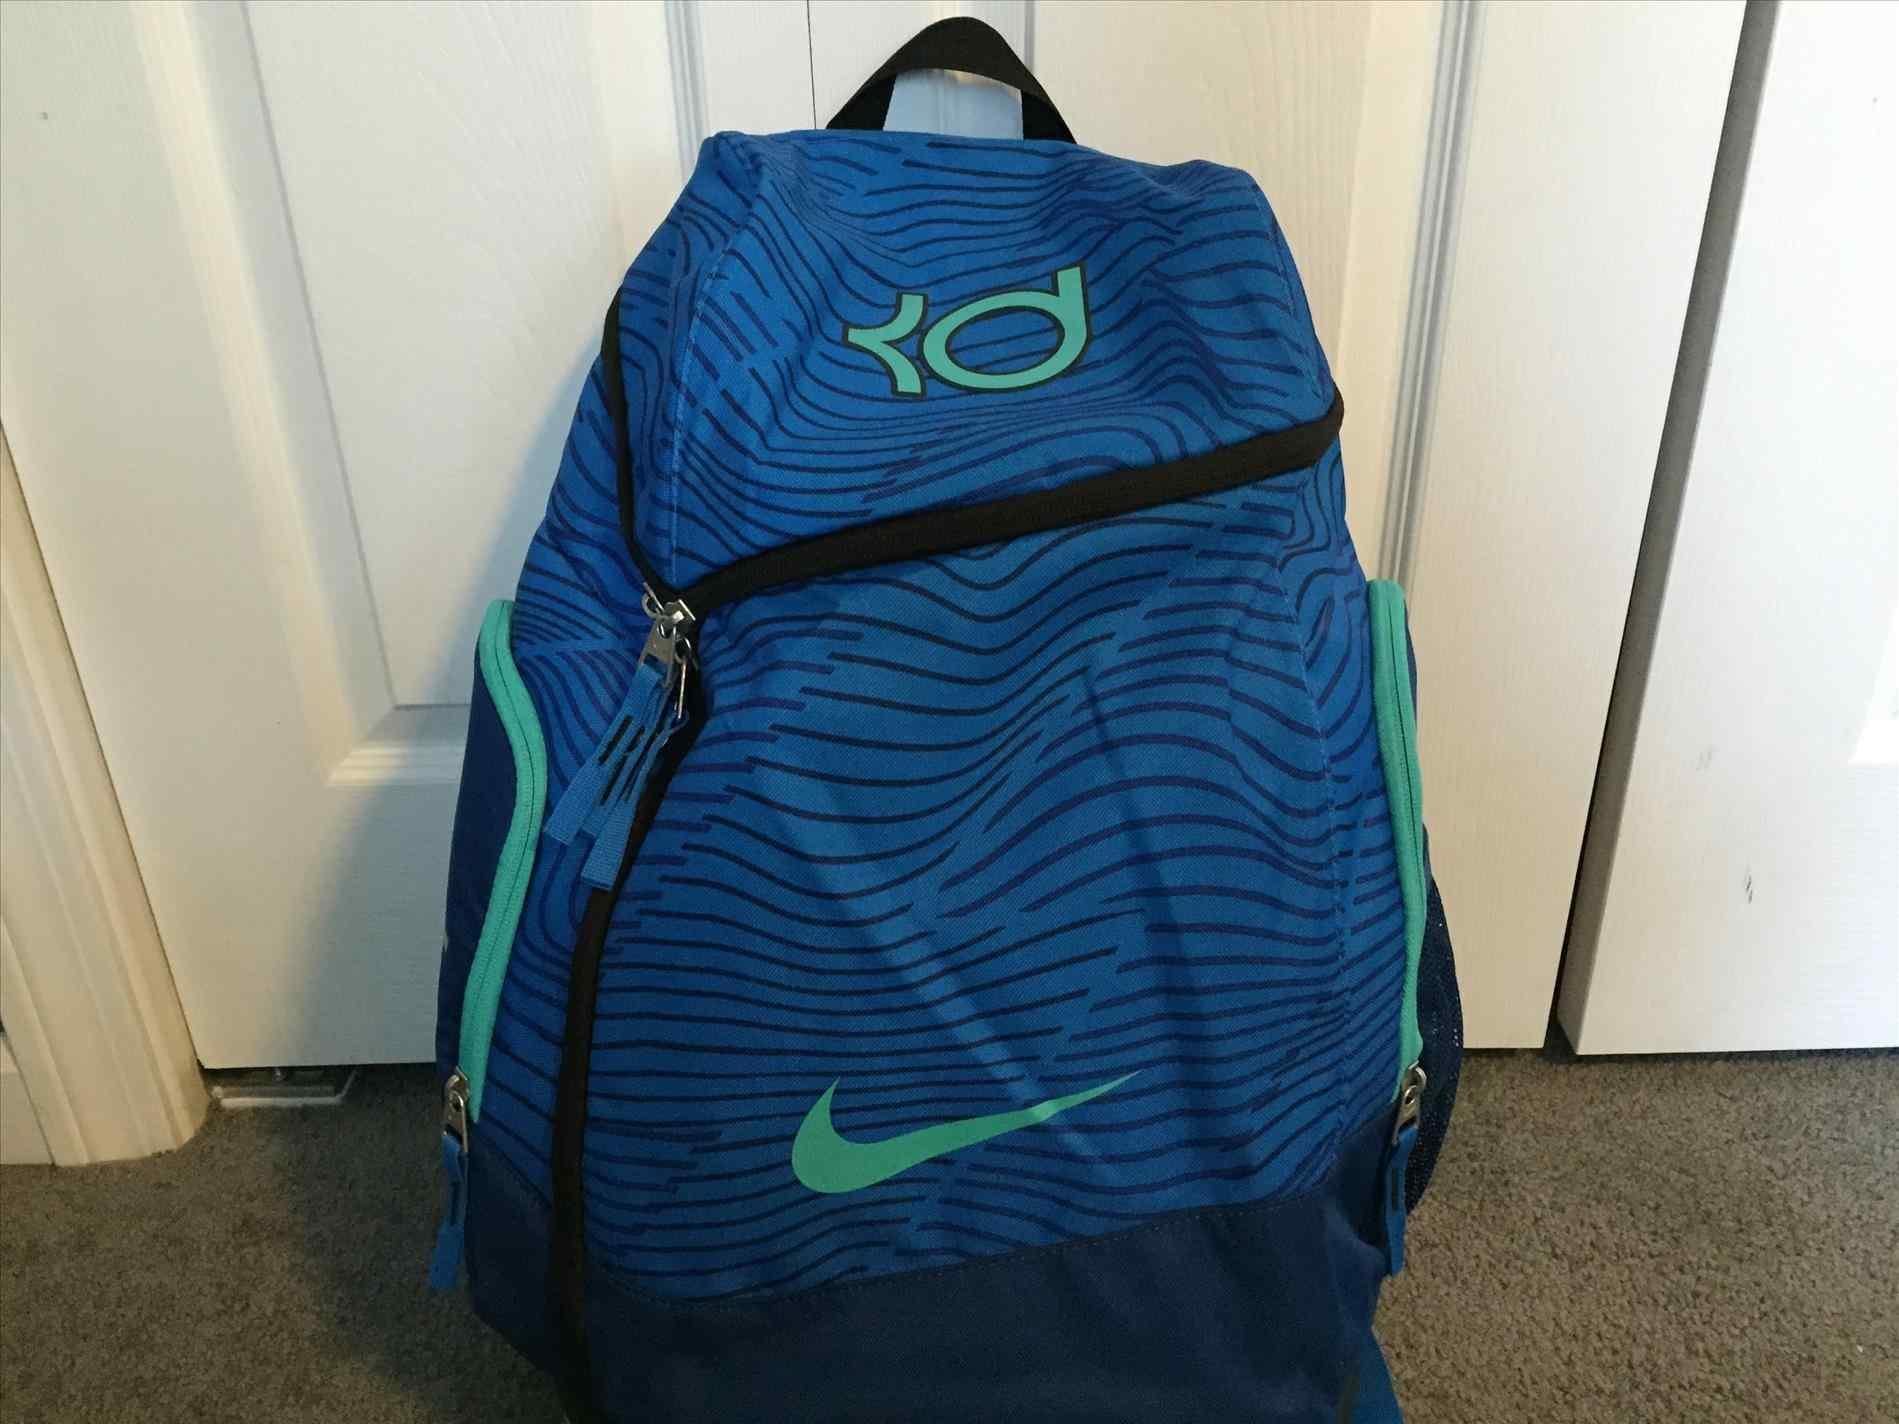 Bookbag clipart backpack. Imagesrhpandacom school backpacks panda